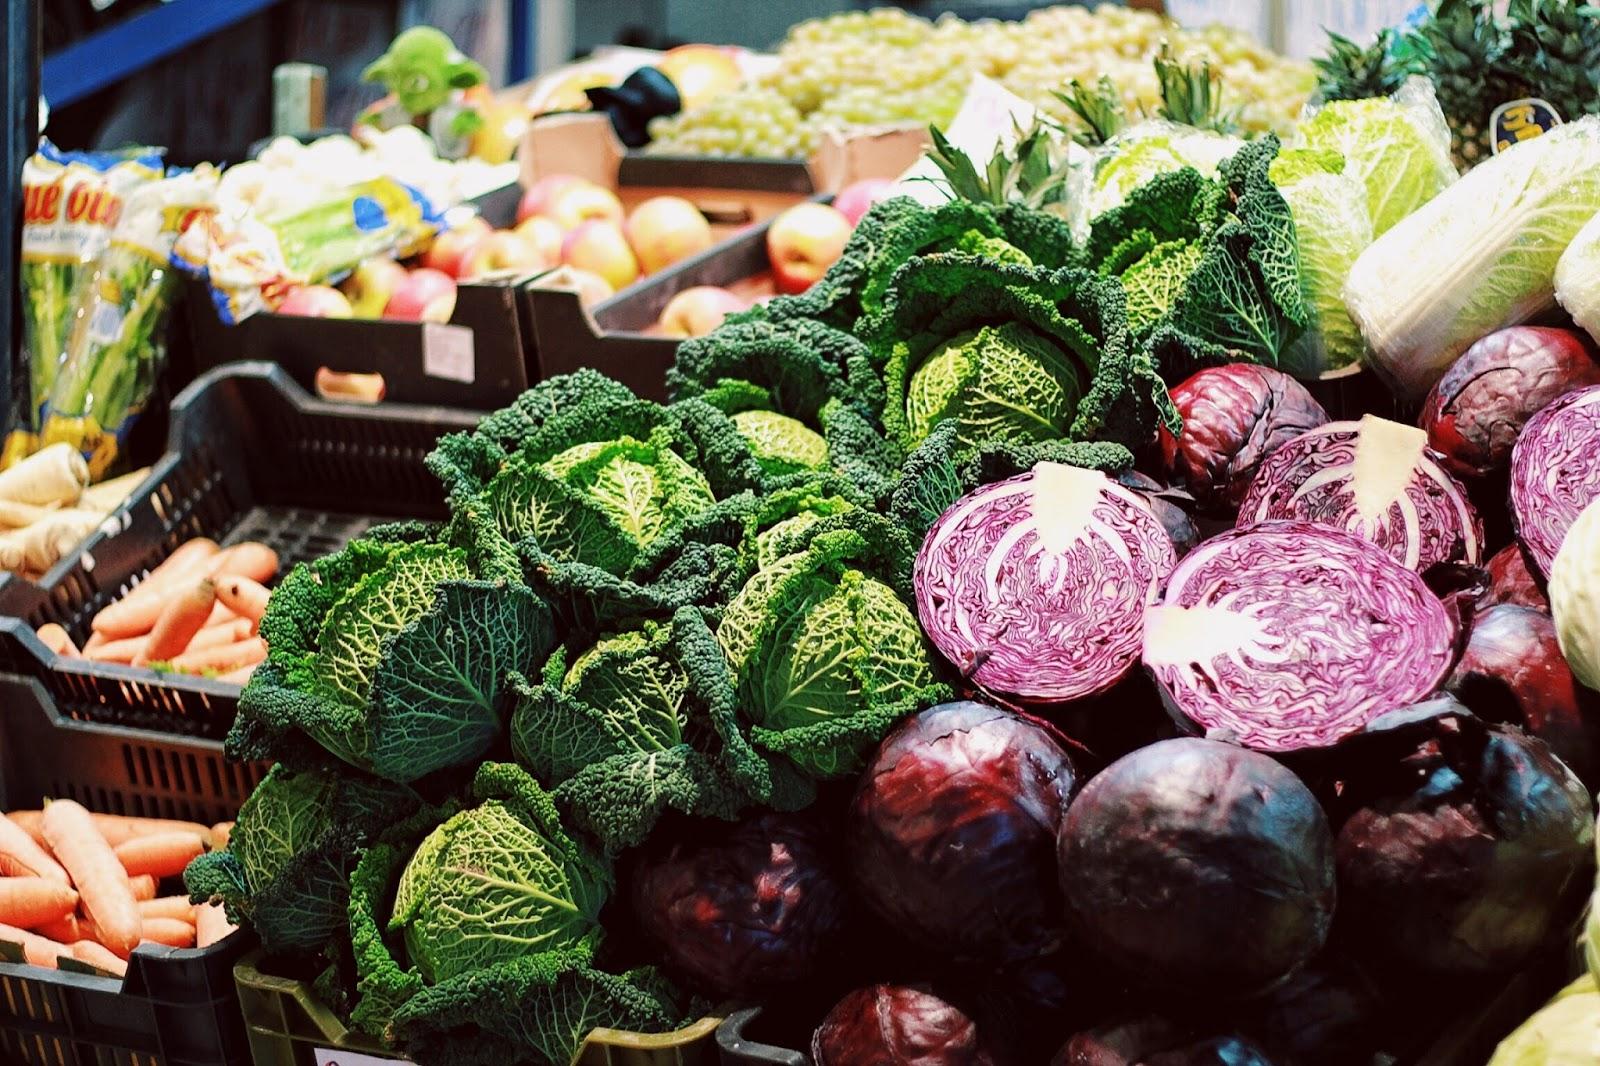 lifesthayle-budapest-great-market-hall-vegetables.jpg